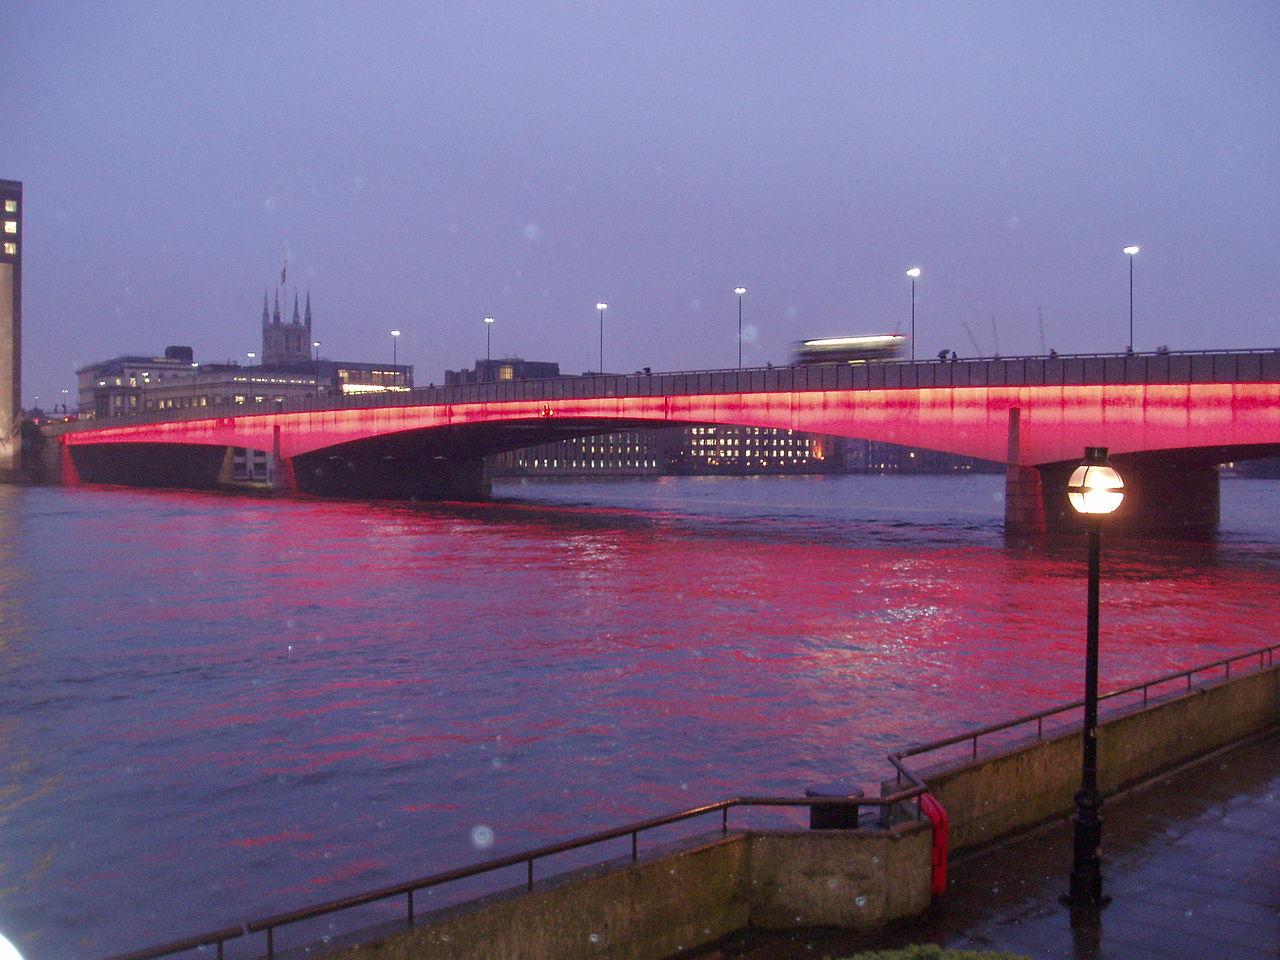 1280px-London_Bridge_Illuminated